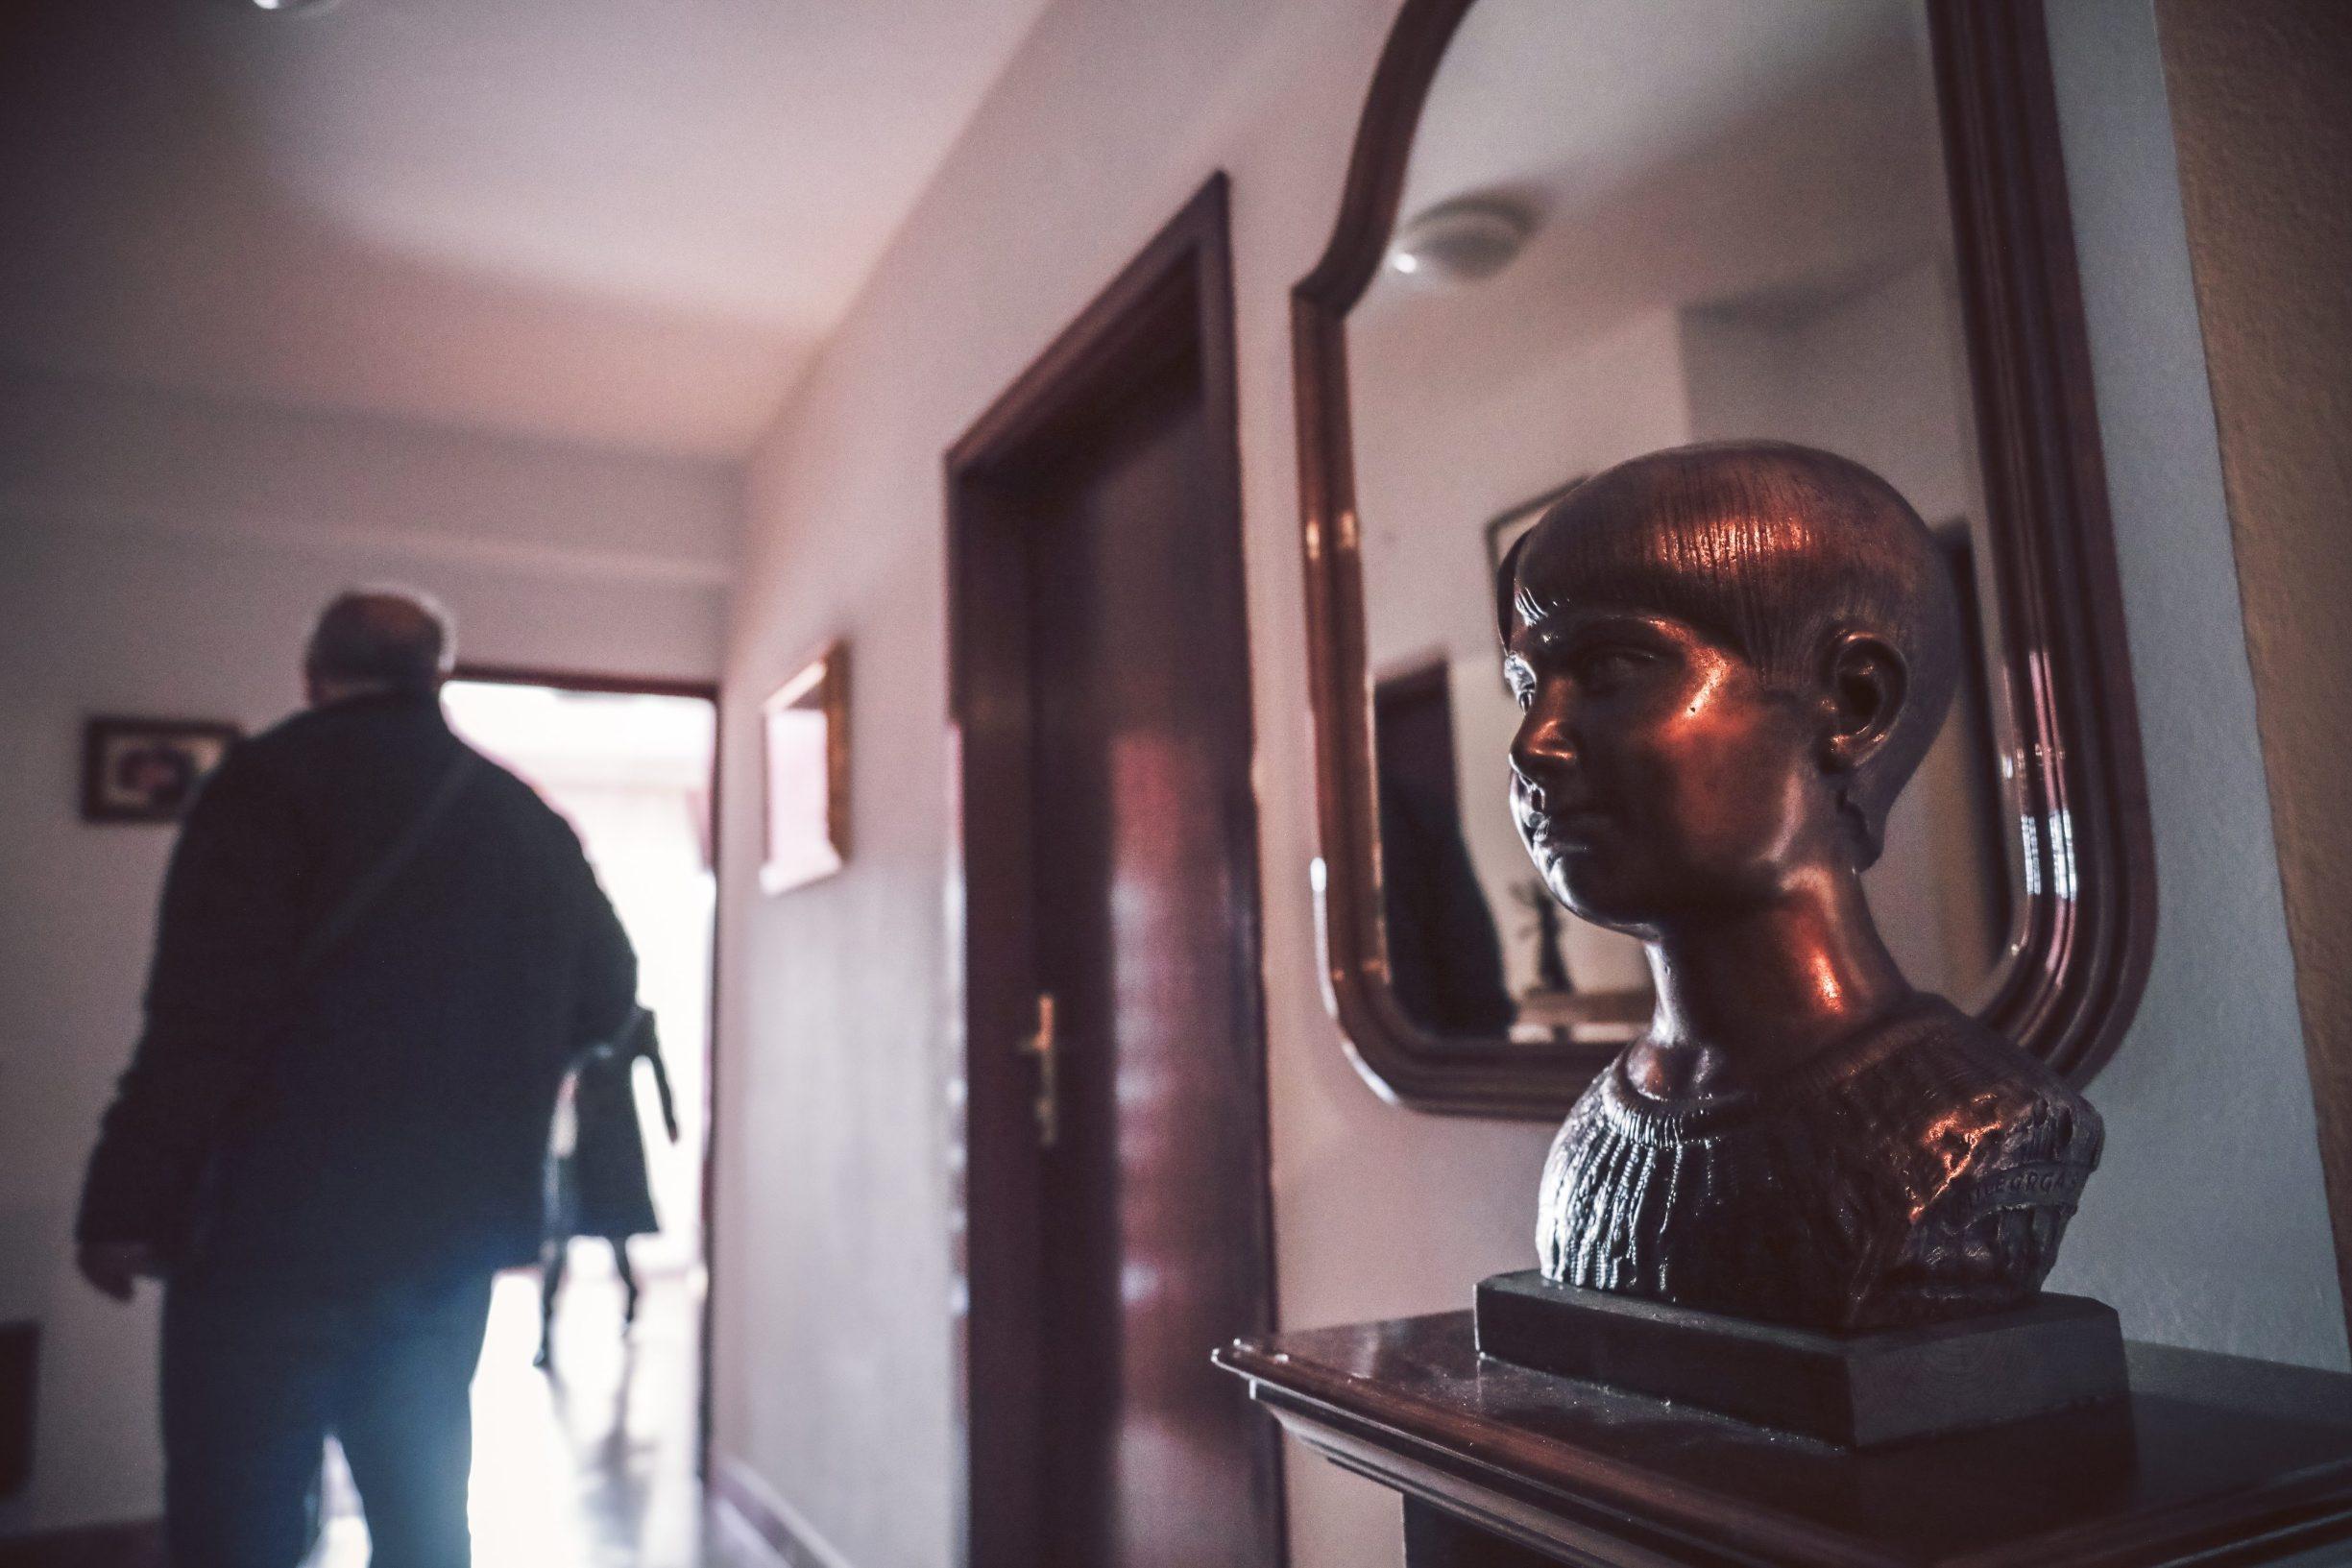 Benkovac, 031219 Reportaza o Benkovcu. Na fotografiji djela kipara Mile Grgasa. Foto: Danijel Soldo / CROPIX